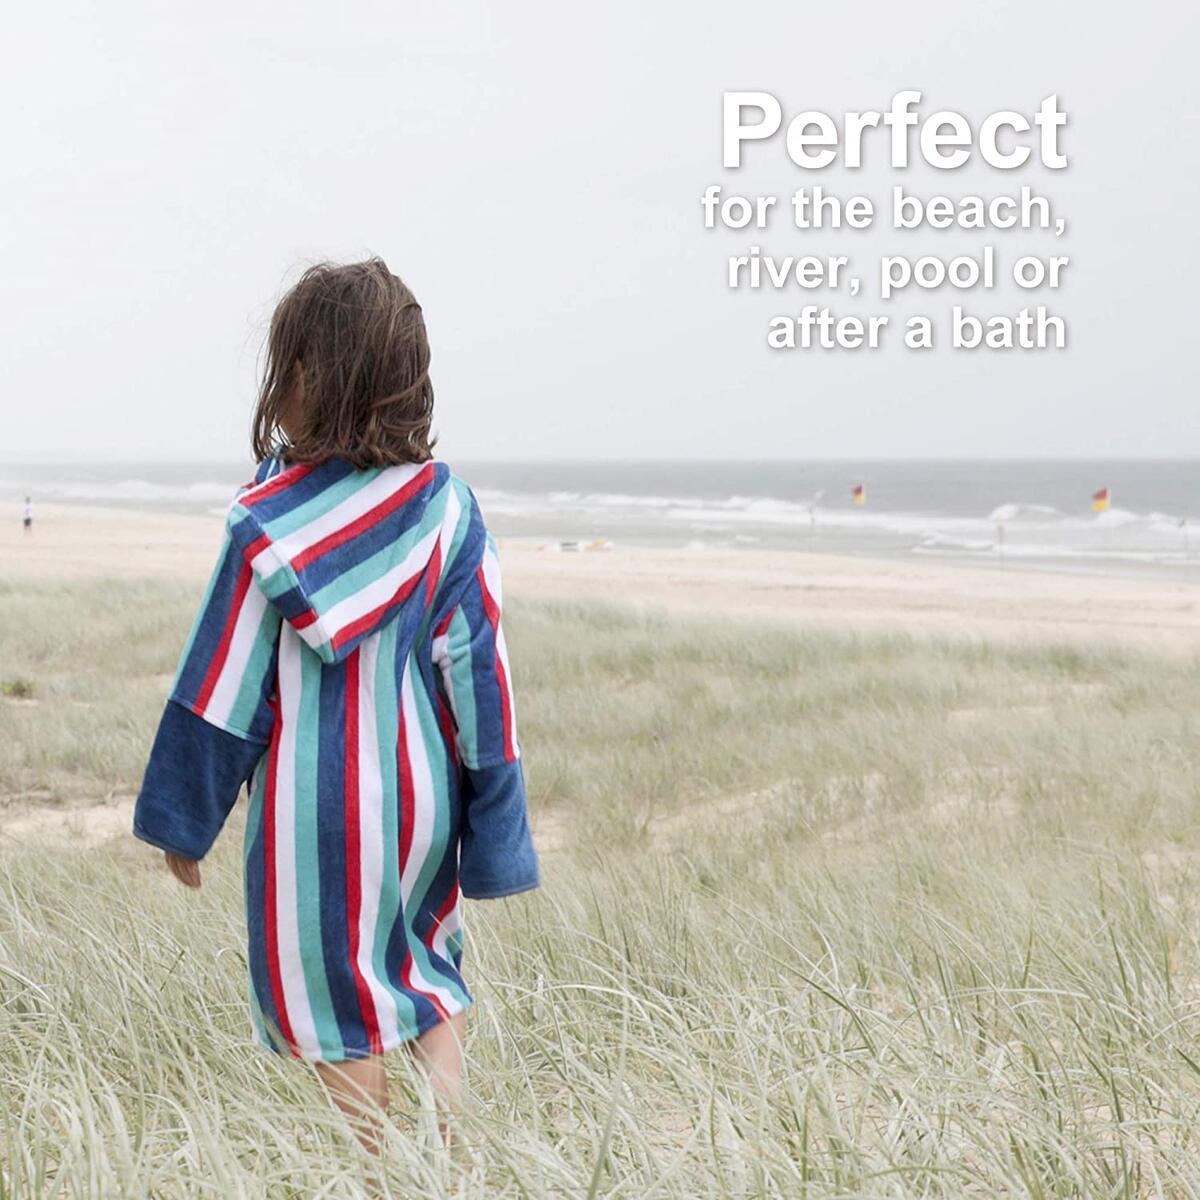 Huggy Adventure Hooded Beach Towel - 100% Cotton (4 Styles)